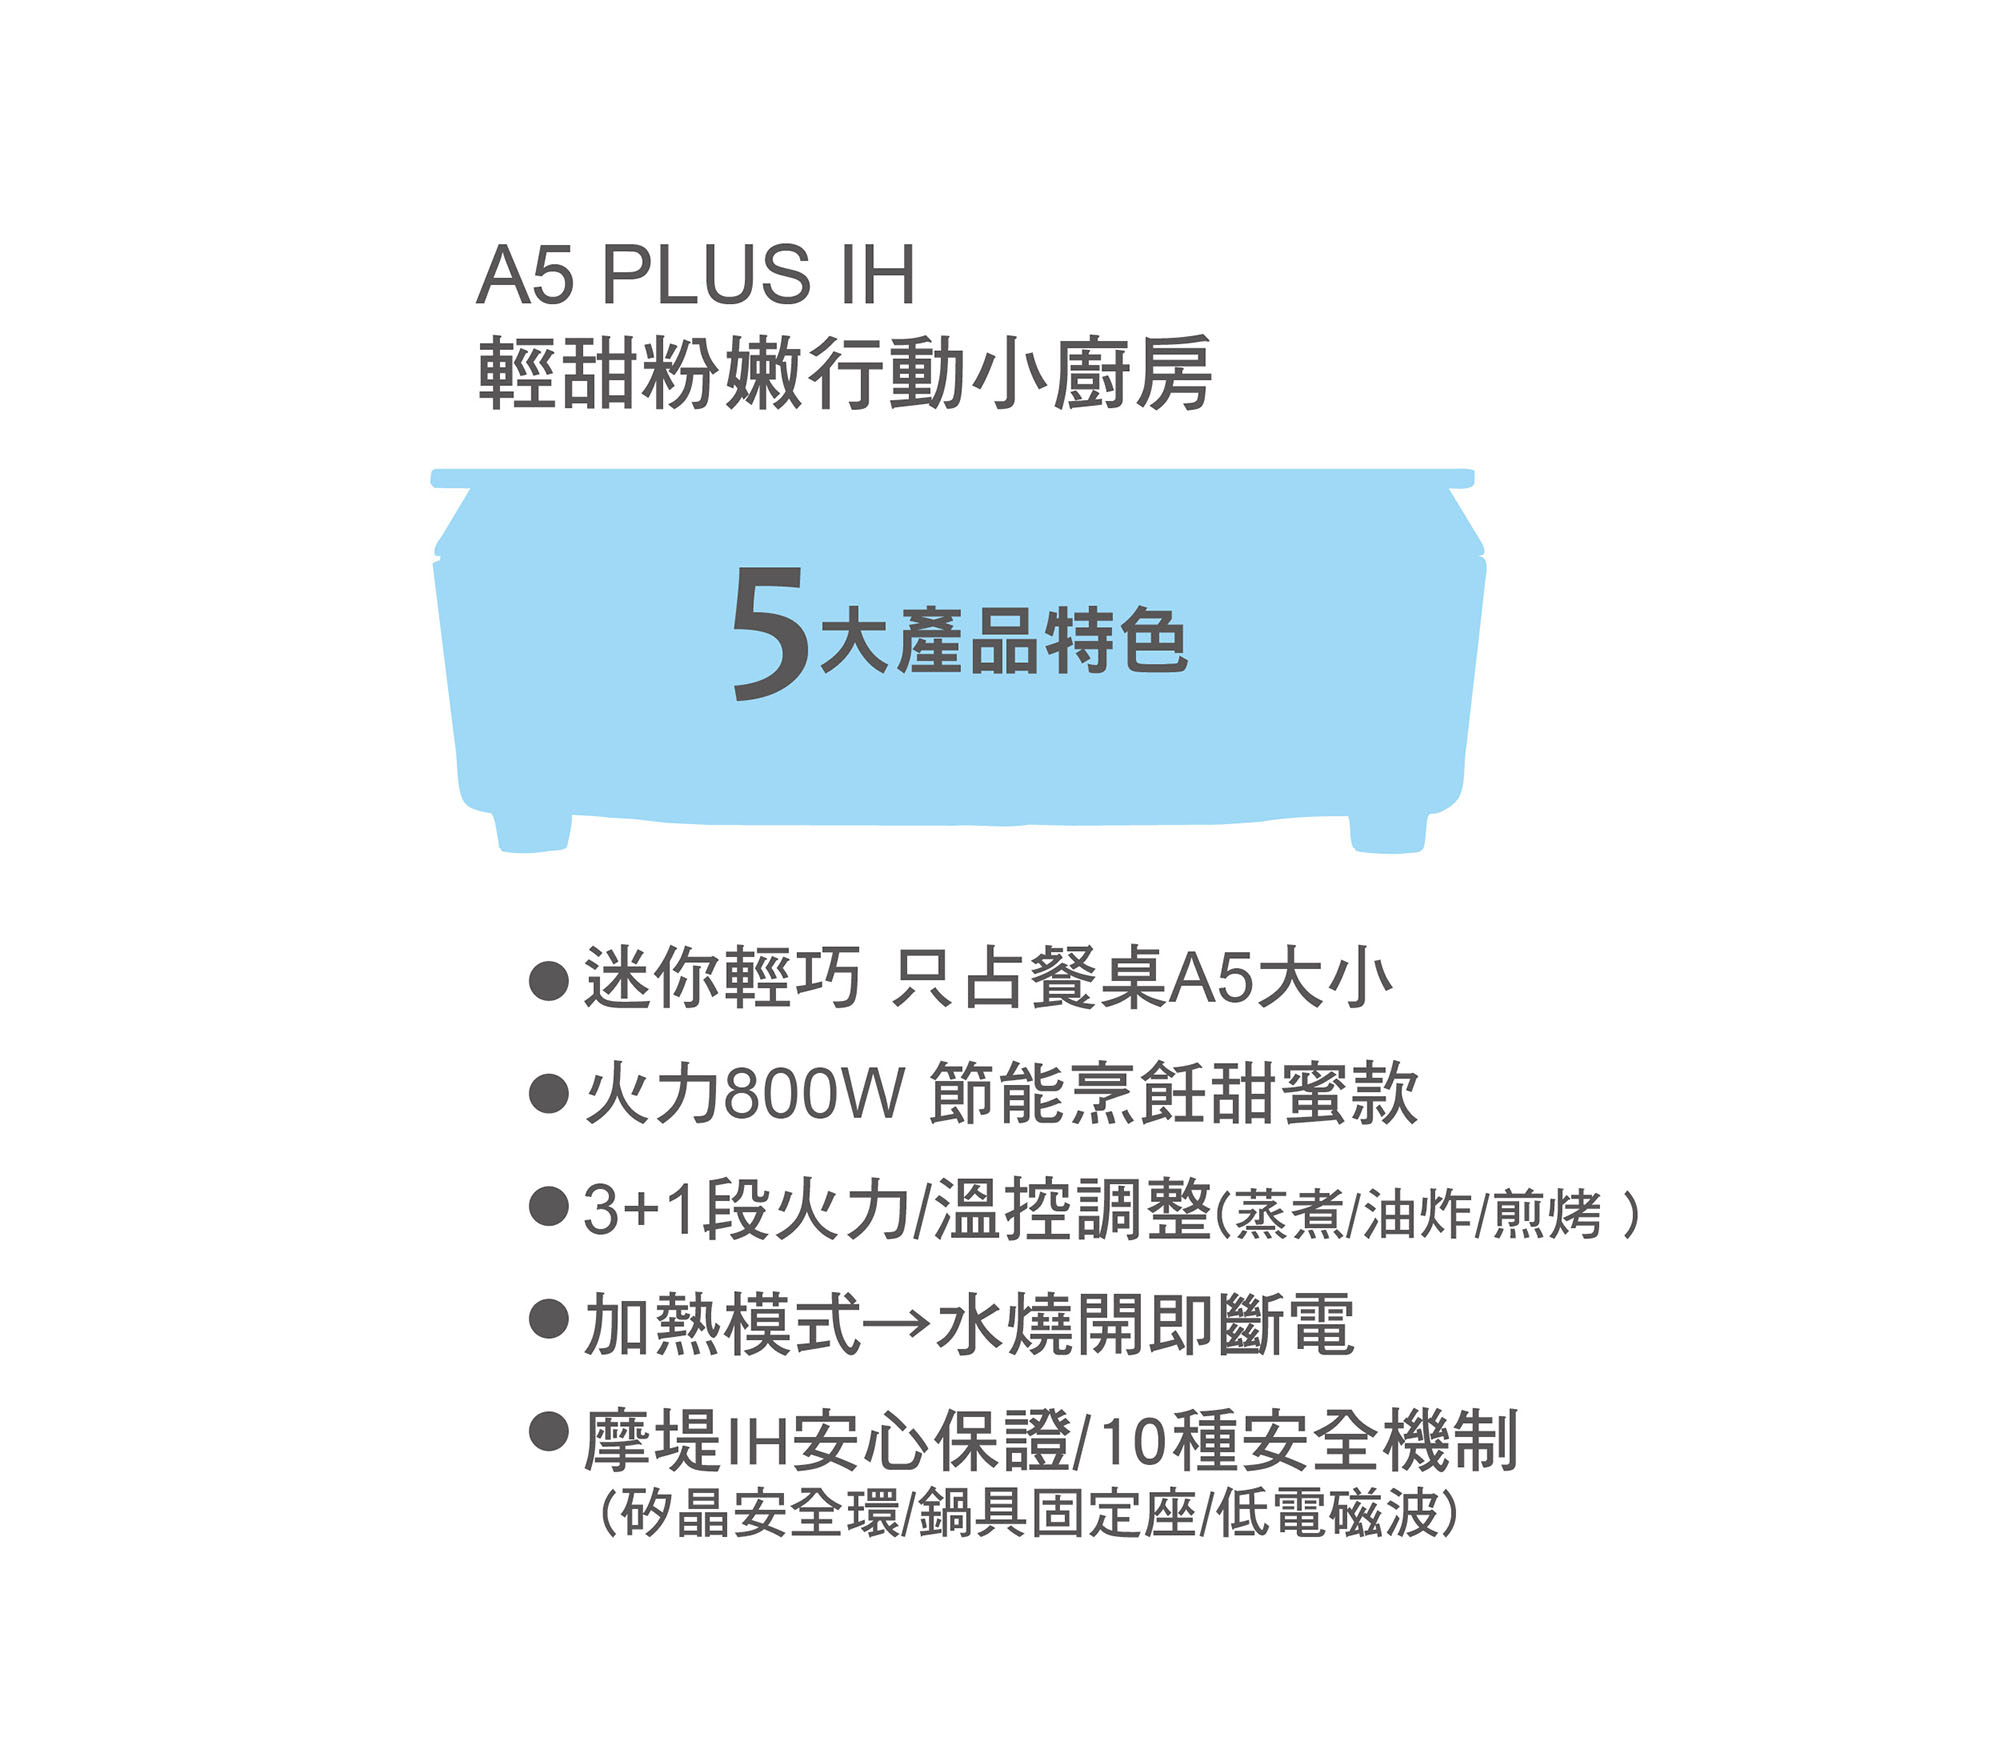 A5 PLUS IH-03.jpg